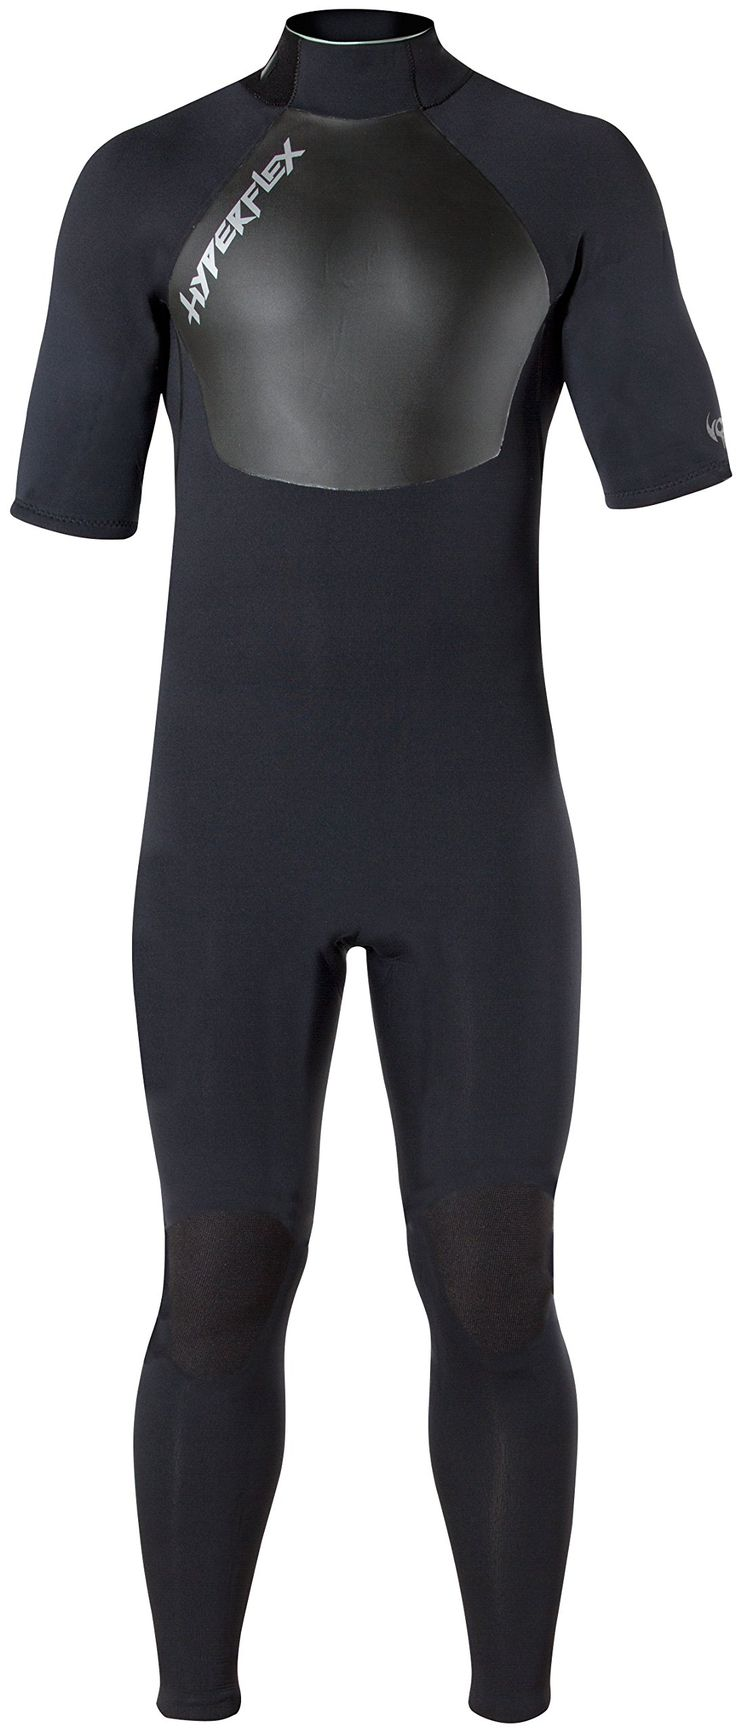 Hyperflex Wetsuits Men's Voodoo 2.5mm Short Sleeve Fullsuit, Black, Large S - Surfing, Windsurfing & Wakeboarding